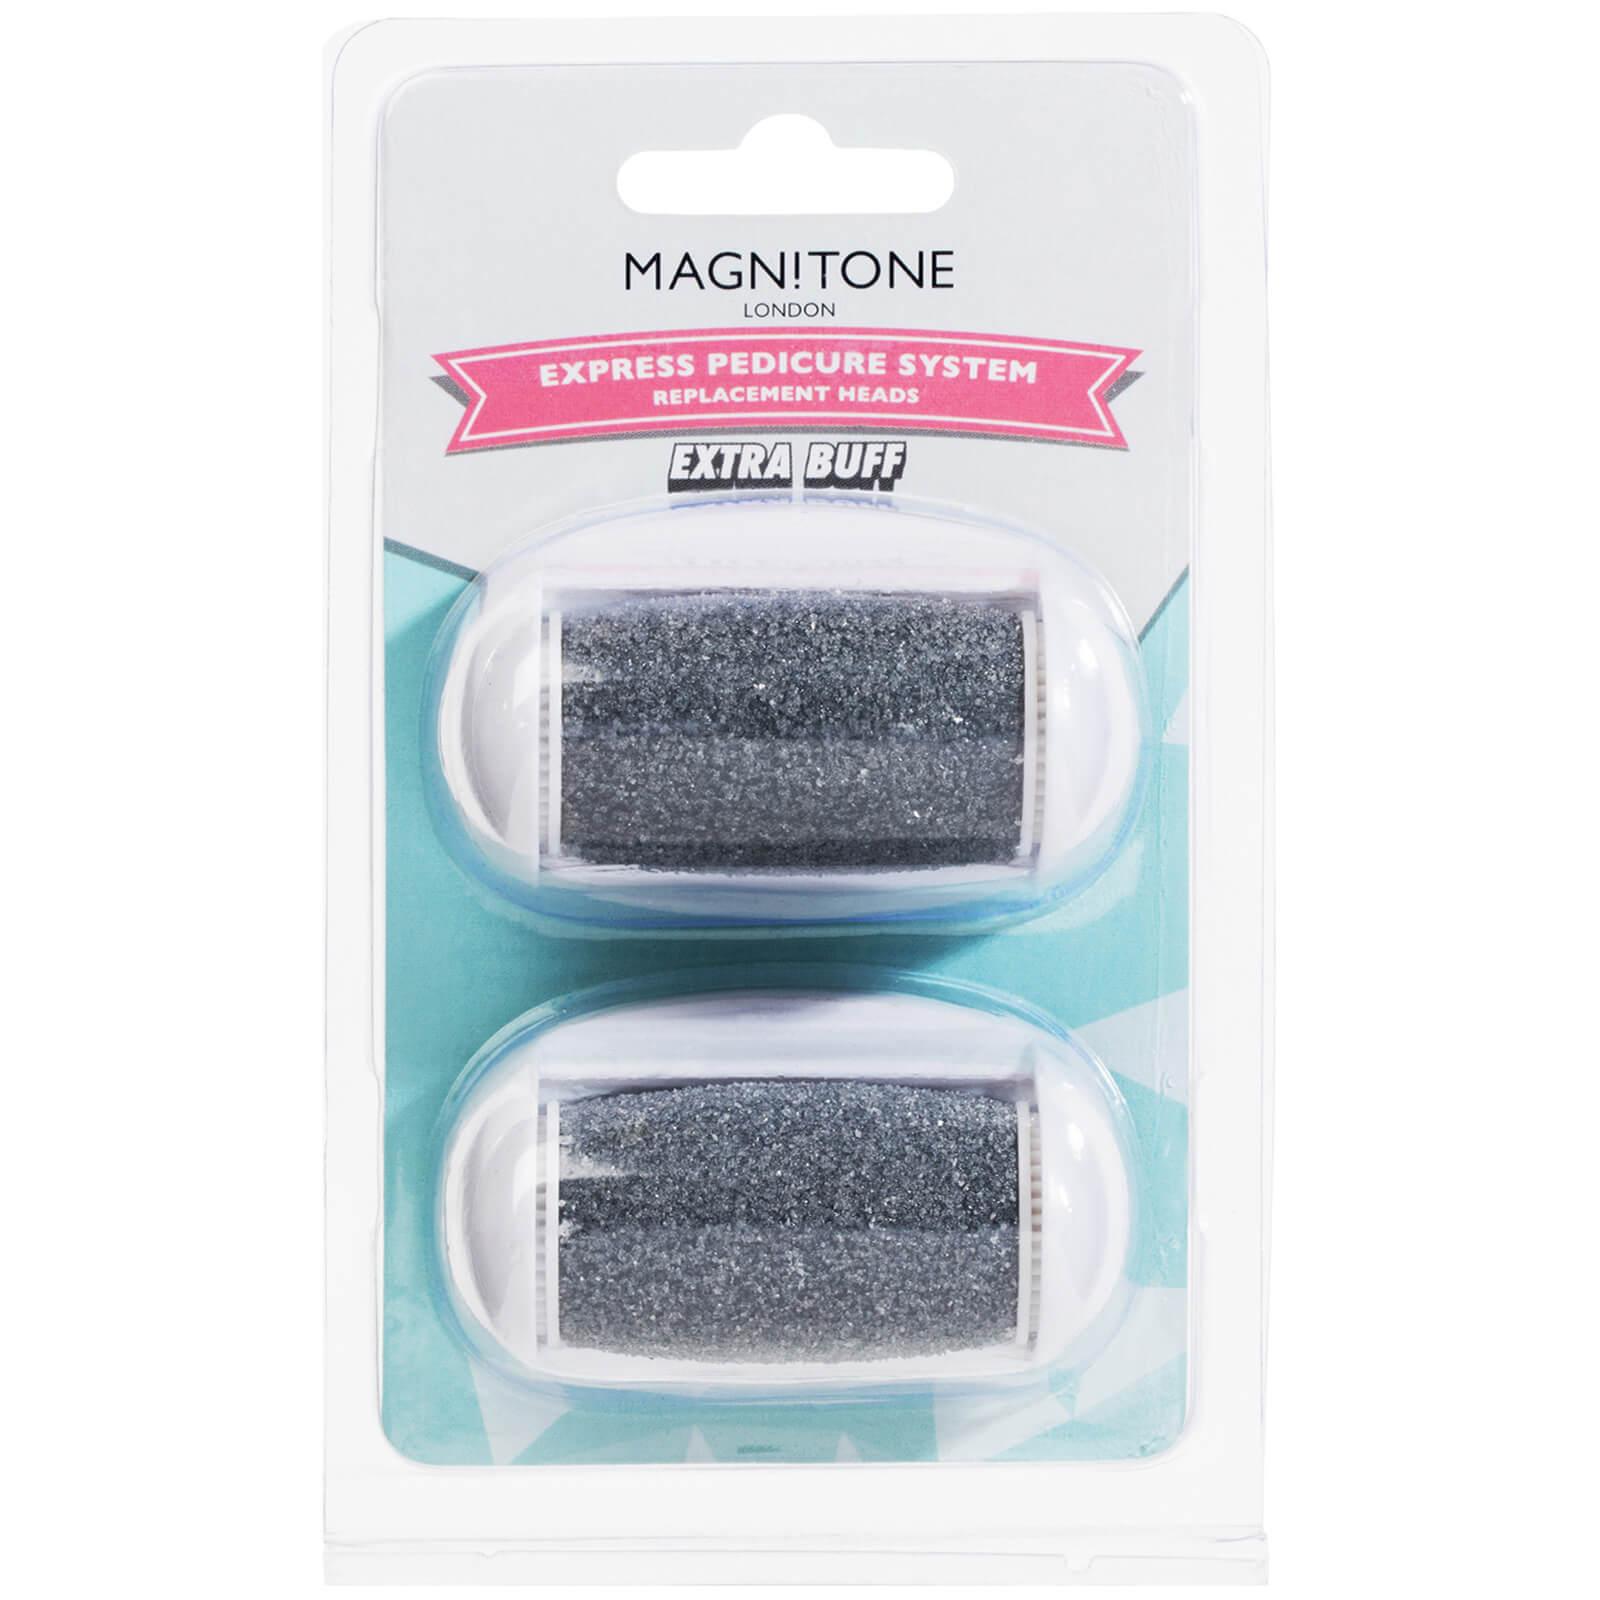 Magnitone London Well Heeled! testina ricambio - esfoliazione extra (x 2)